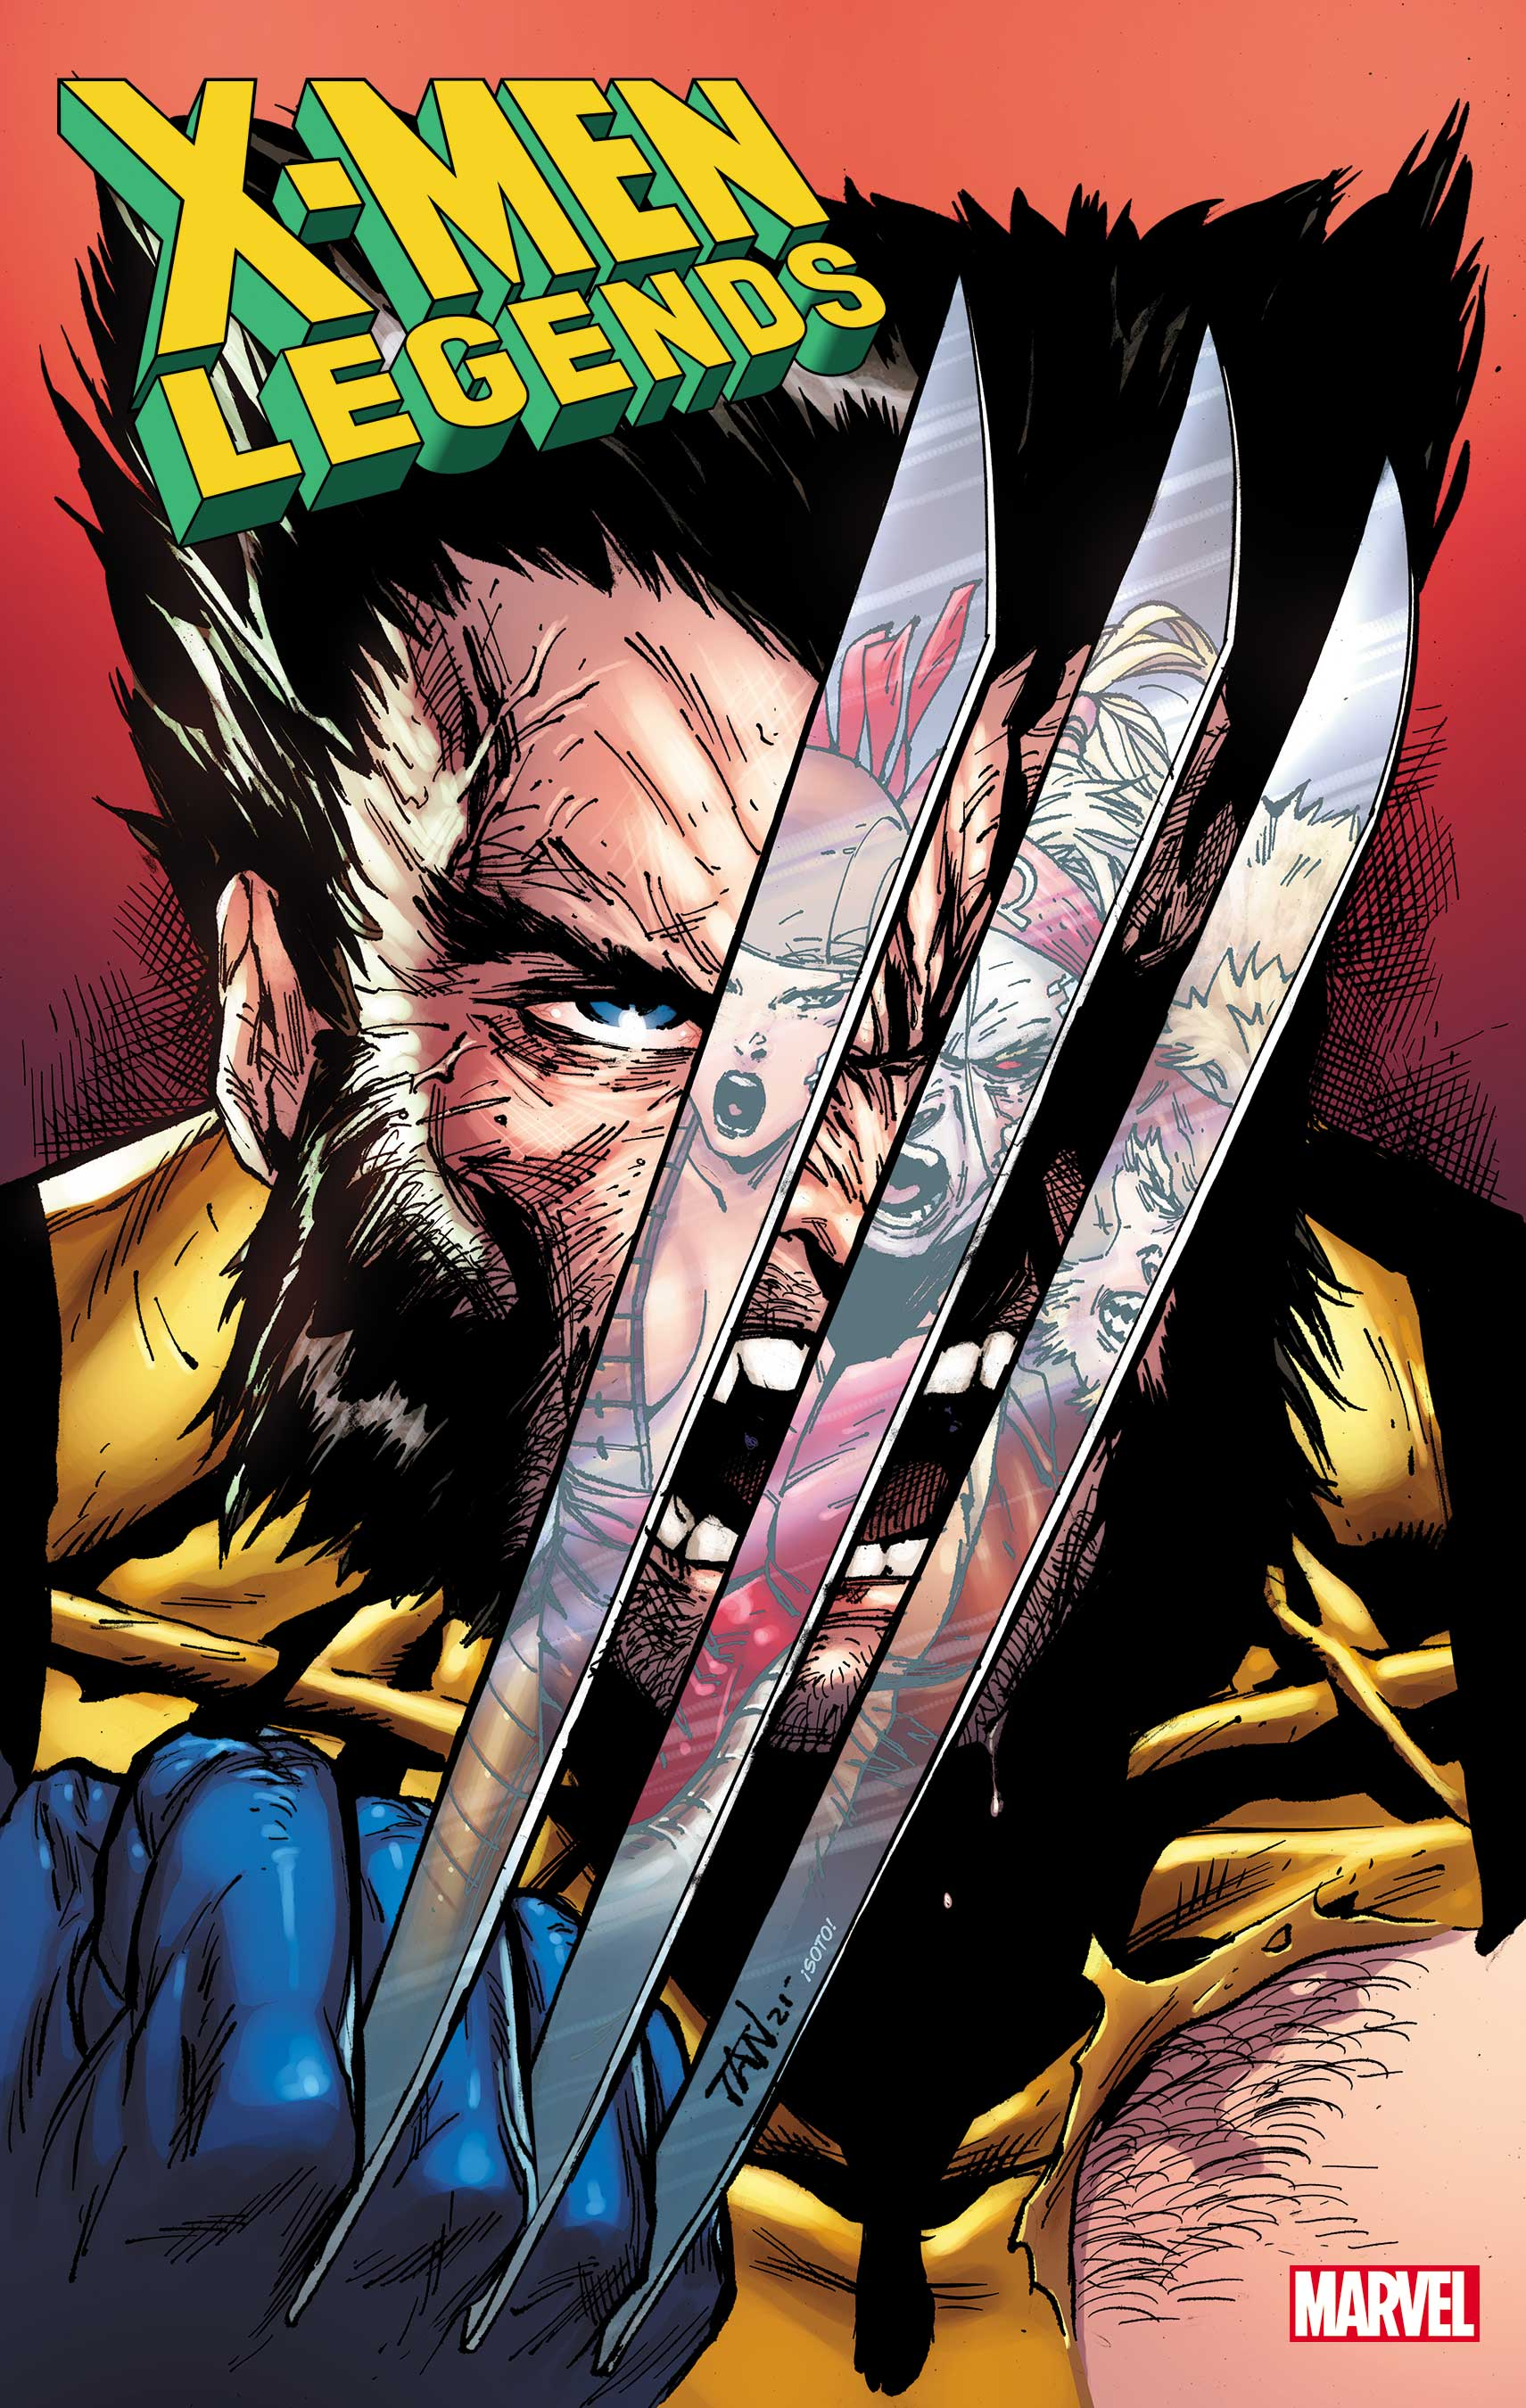 X-Men Legends (2021) #9